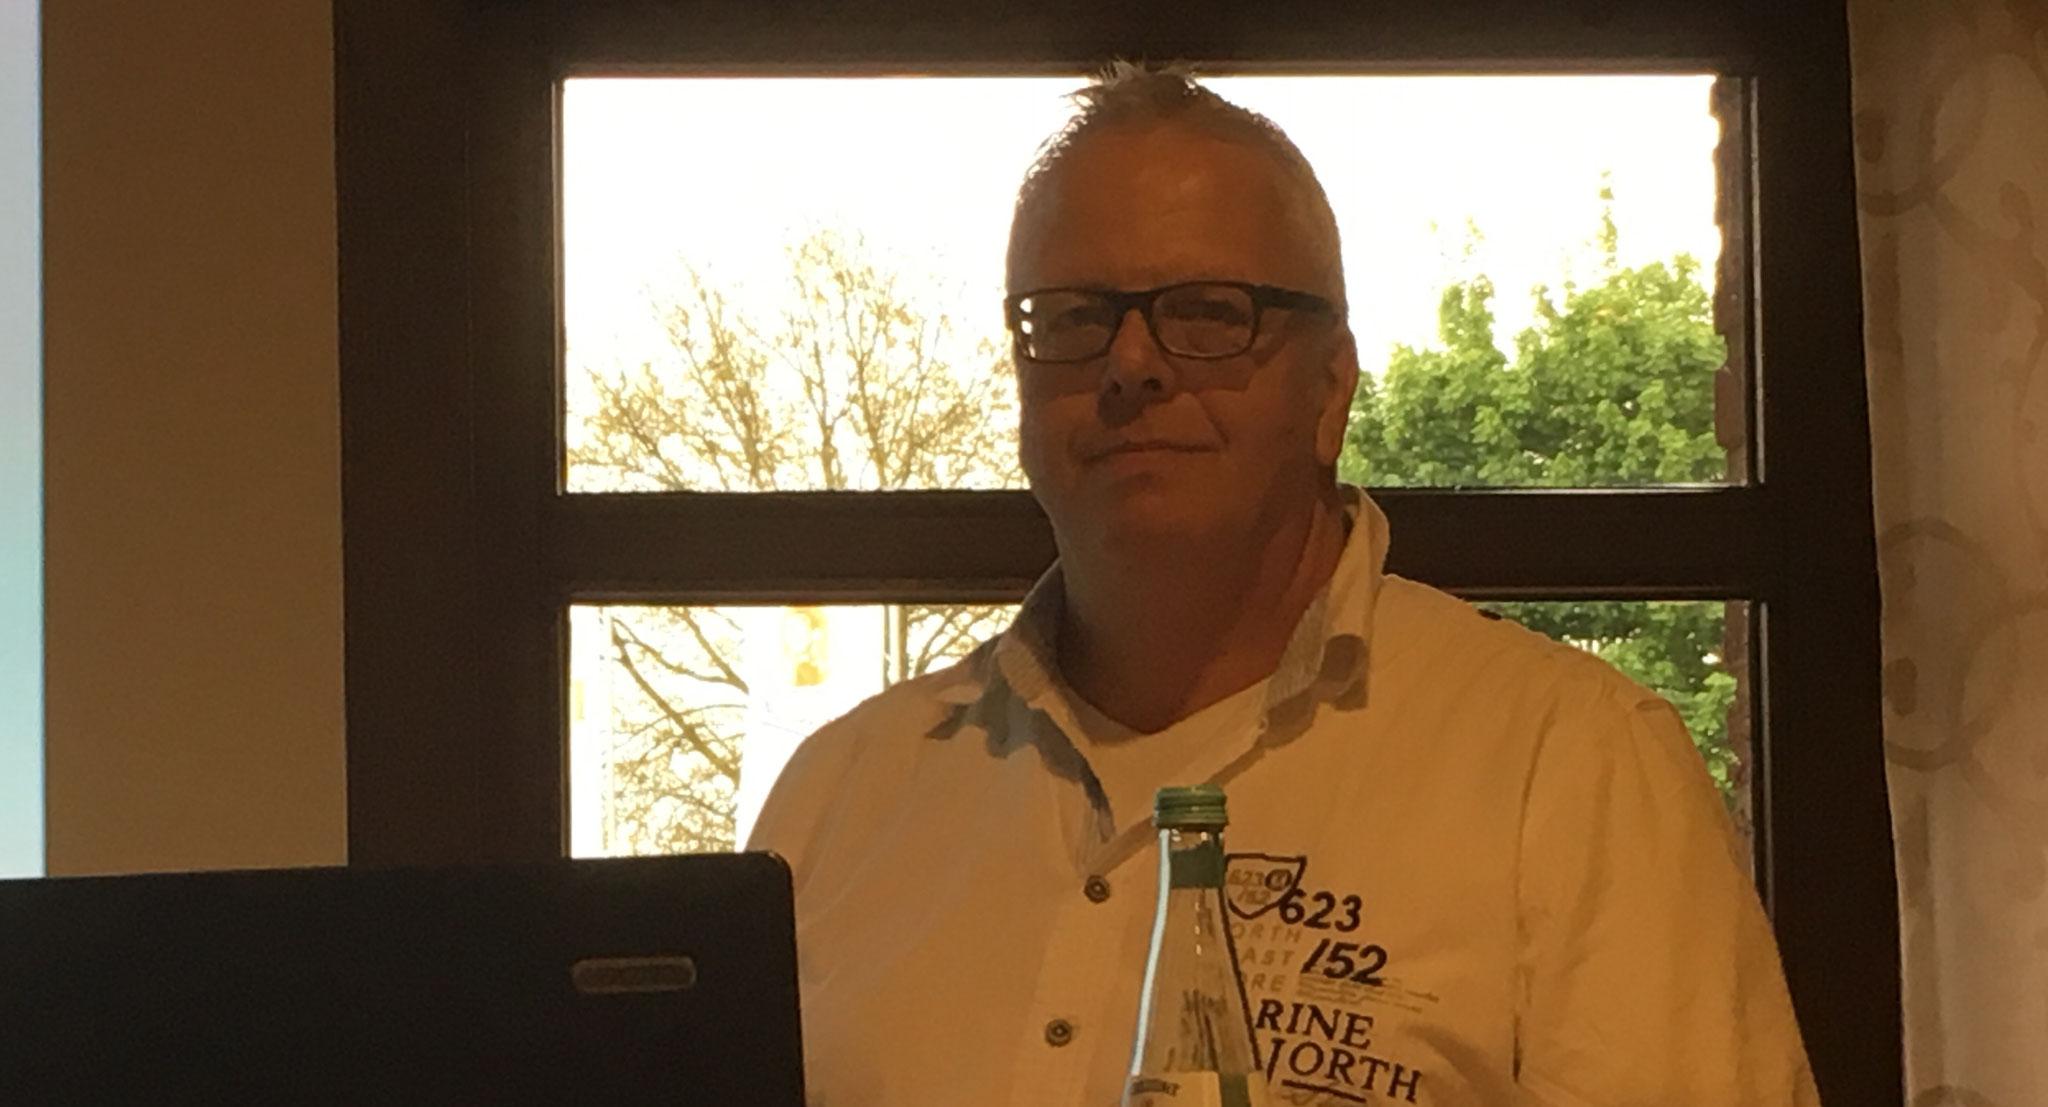 Referent: Thomas Wieling vom SKF    (Sozialdienst katholischer Frauen e.V.)